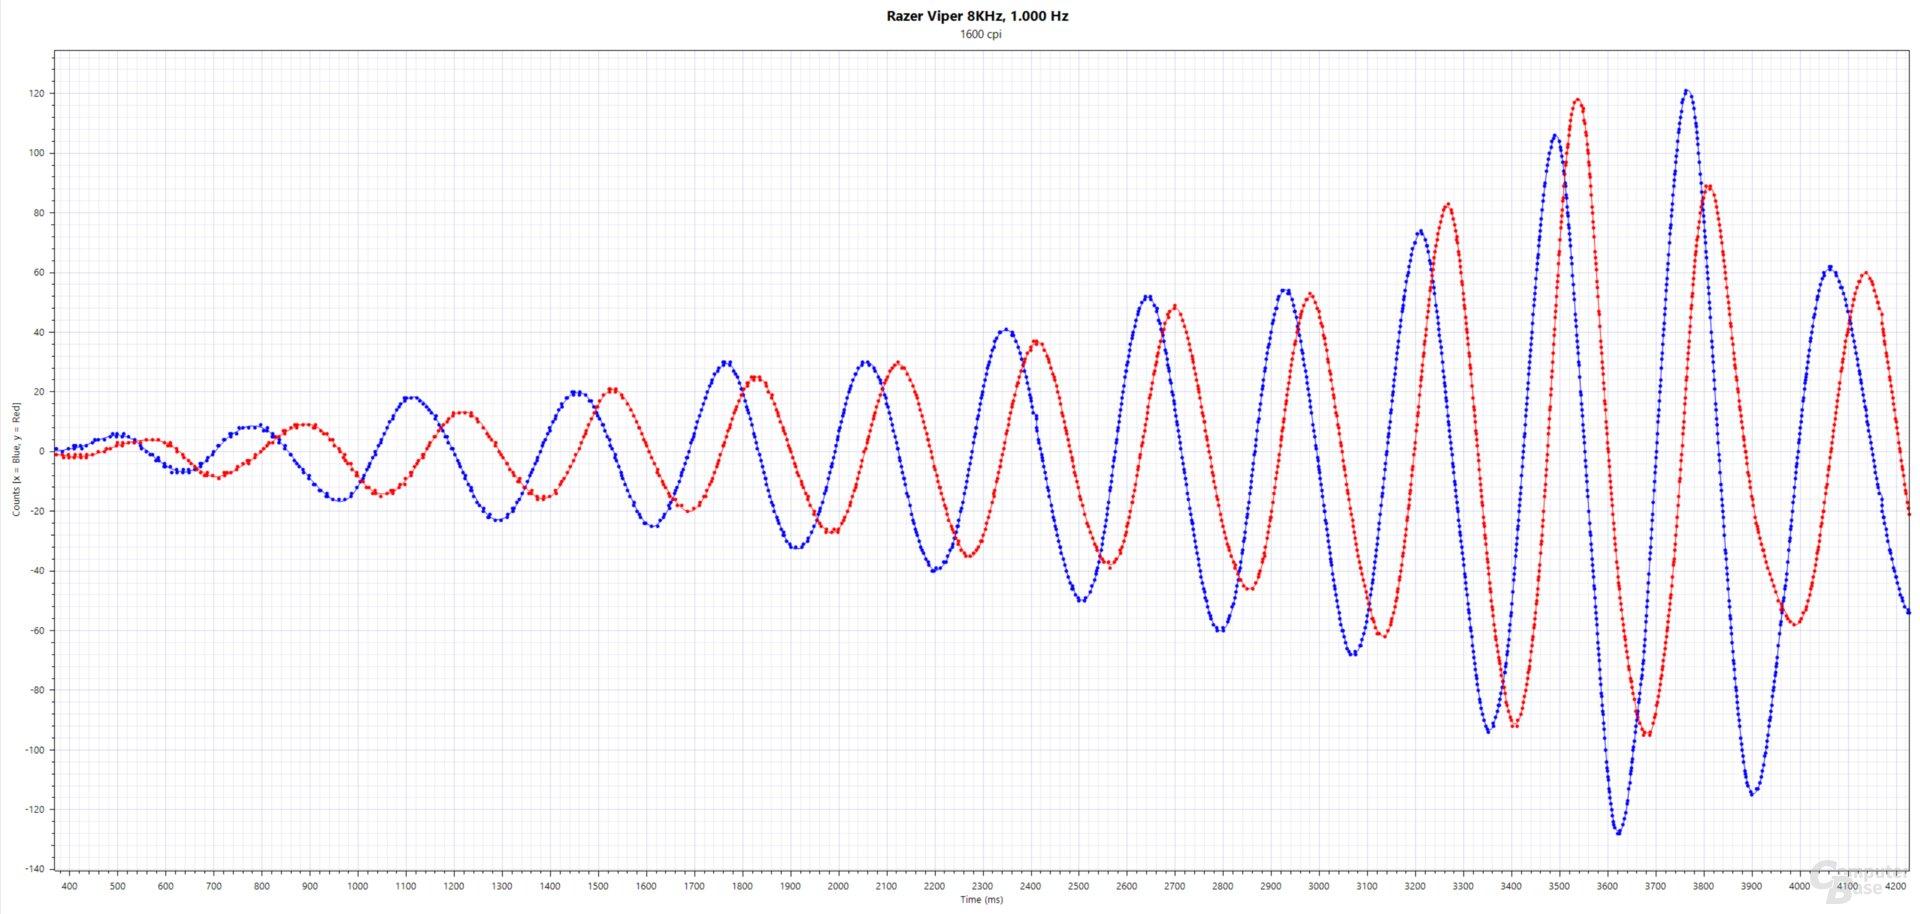 Blau: xCounts(ms), Rot: yCounts(ms); Razer Viper 8KHz (PMW-3399, 1.600 cpi, 1.000 Hertz, Stoffmauspad)